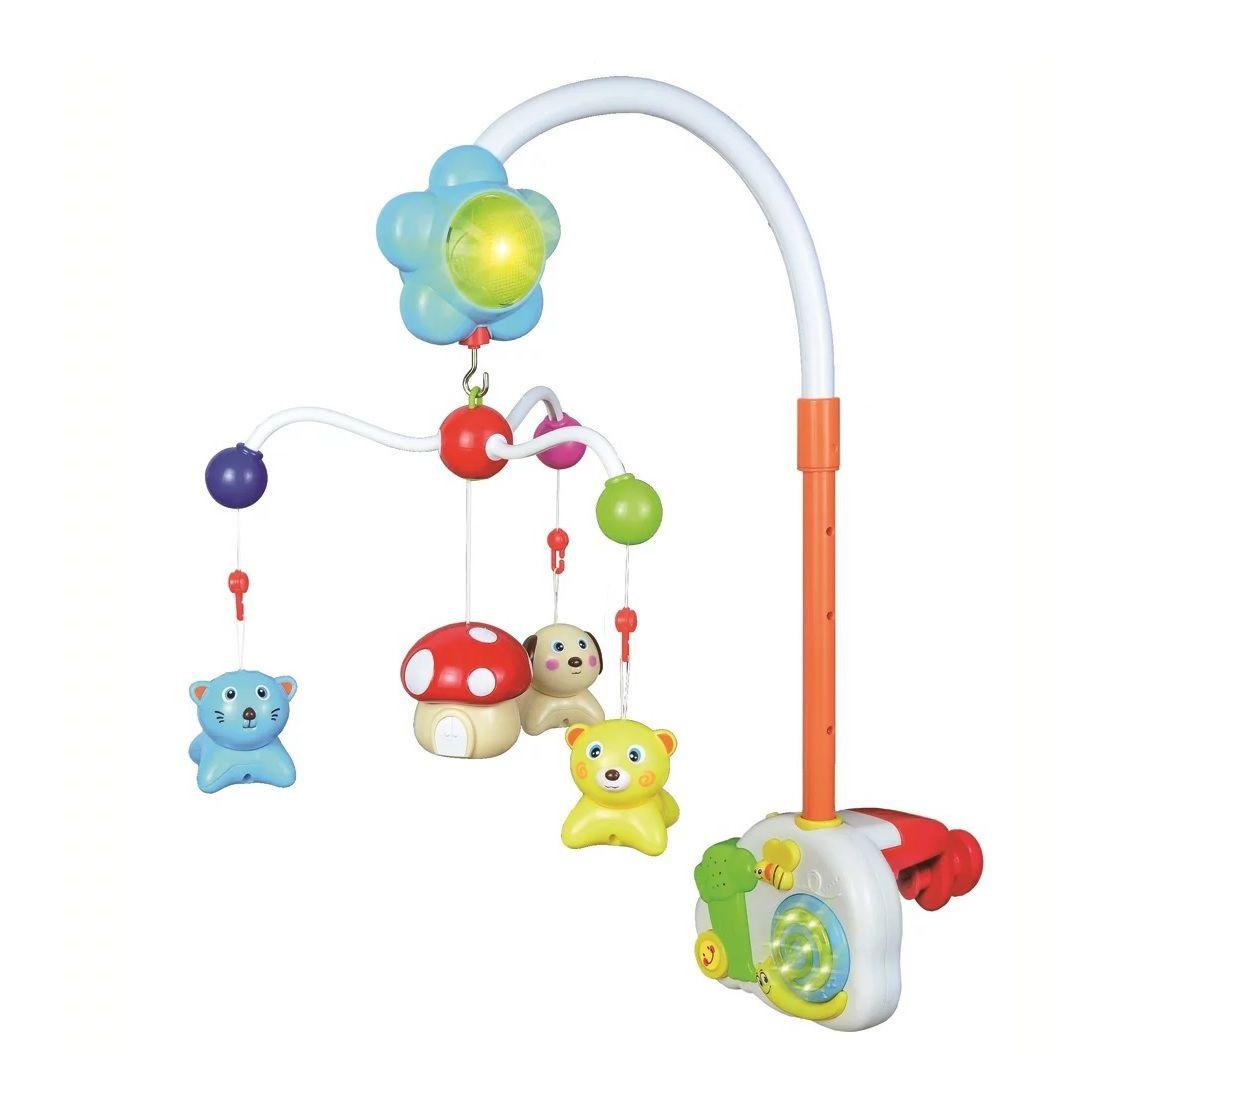 Móbile Musical para Berço Primeiros Passos - Zoop Toys